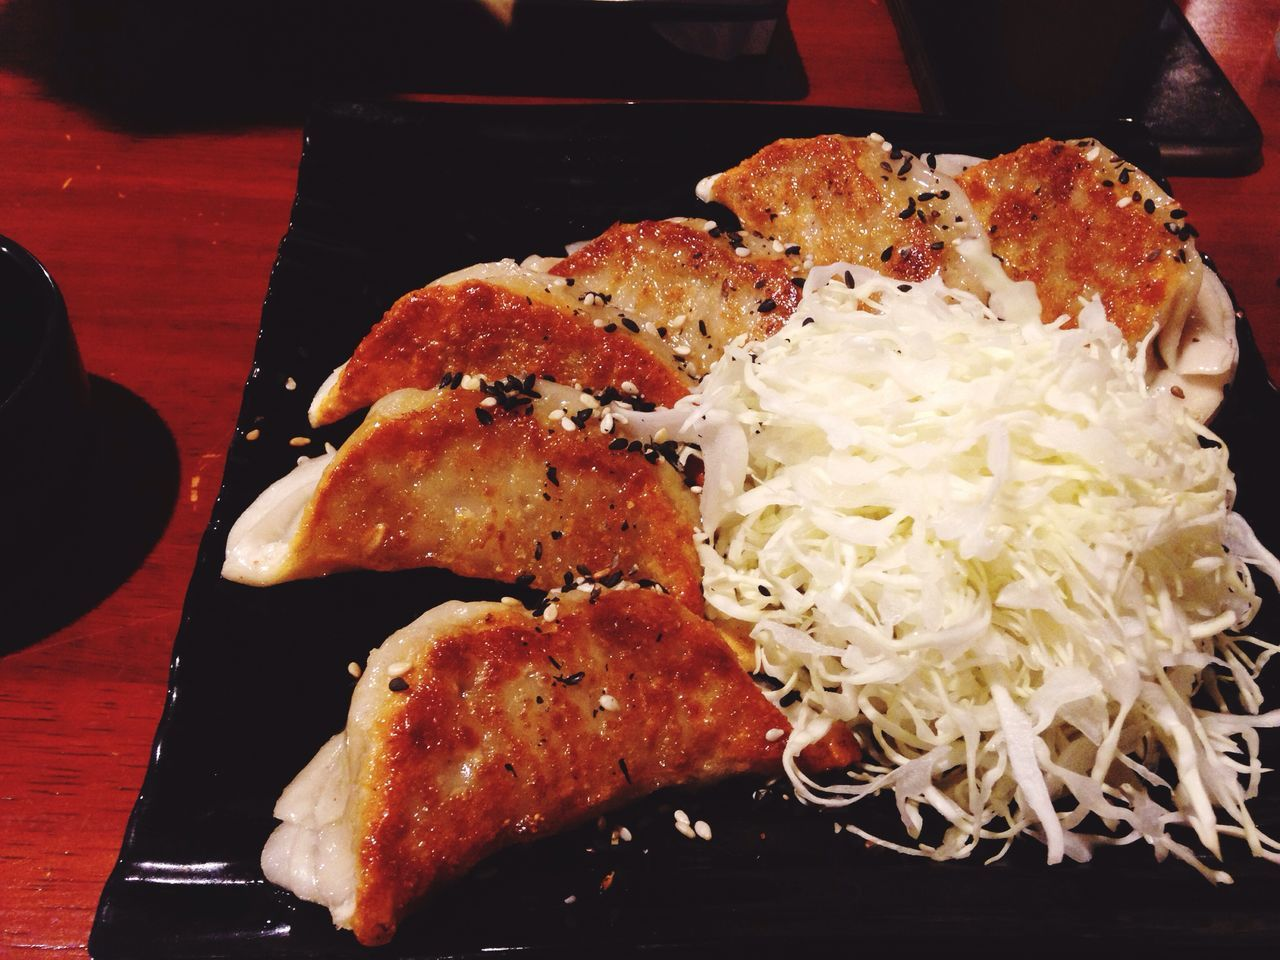 Fried Kyosa! Kyosa Fried Dipping Starter Dinner Japanese Food Style Dinner Tora Tora Phadiphat Rd. Bangkok Friday Food